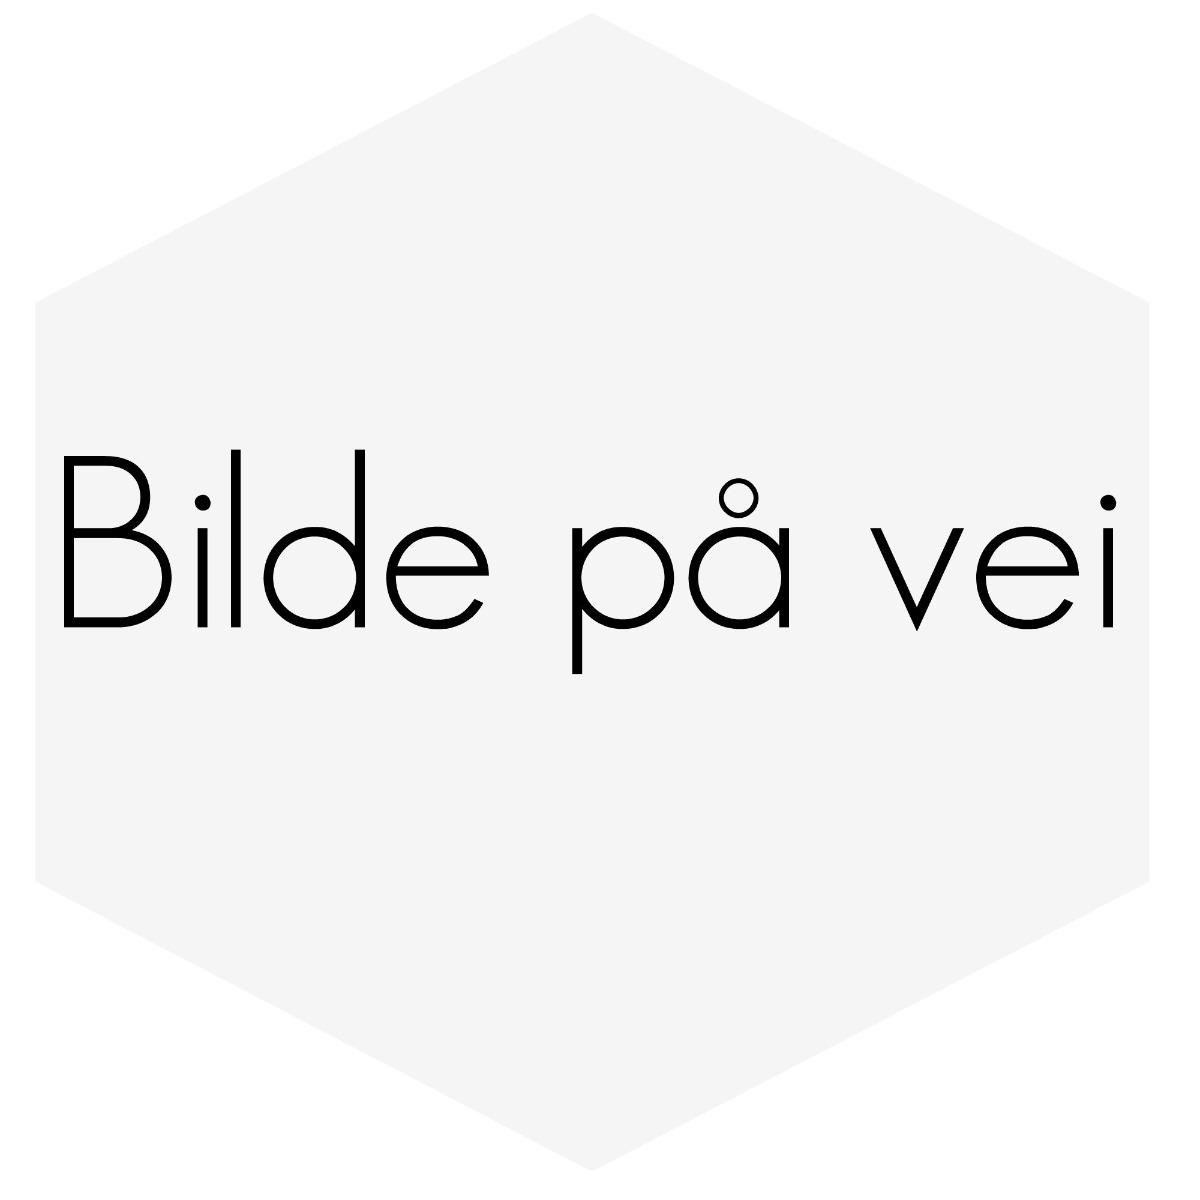 VINDAVVISERE SATS VOLVO V90 2016 -